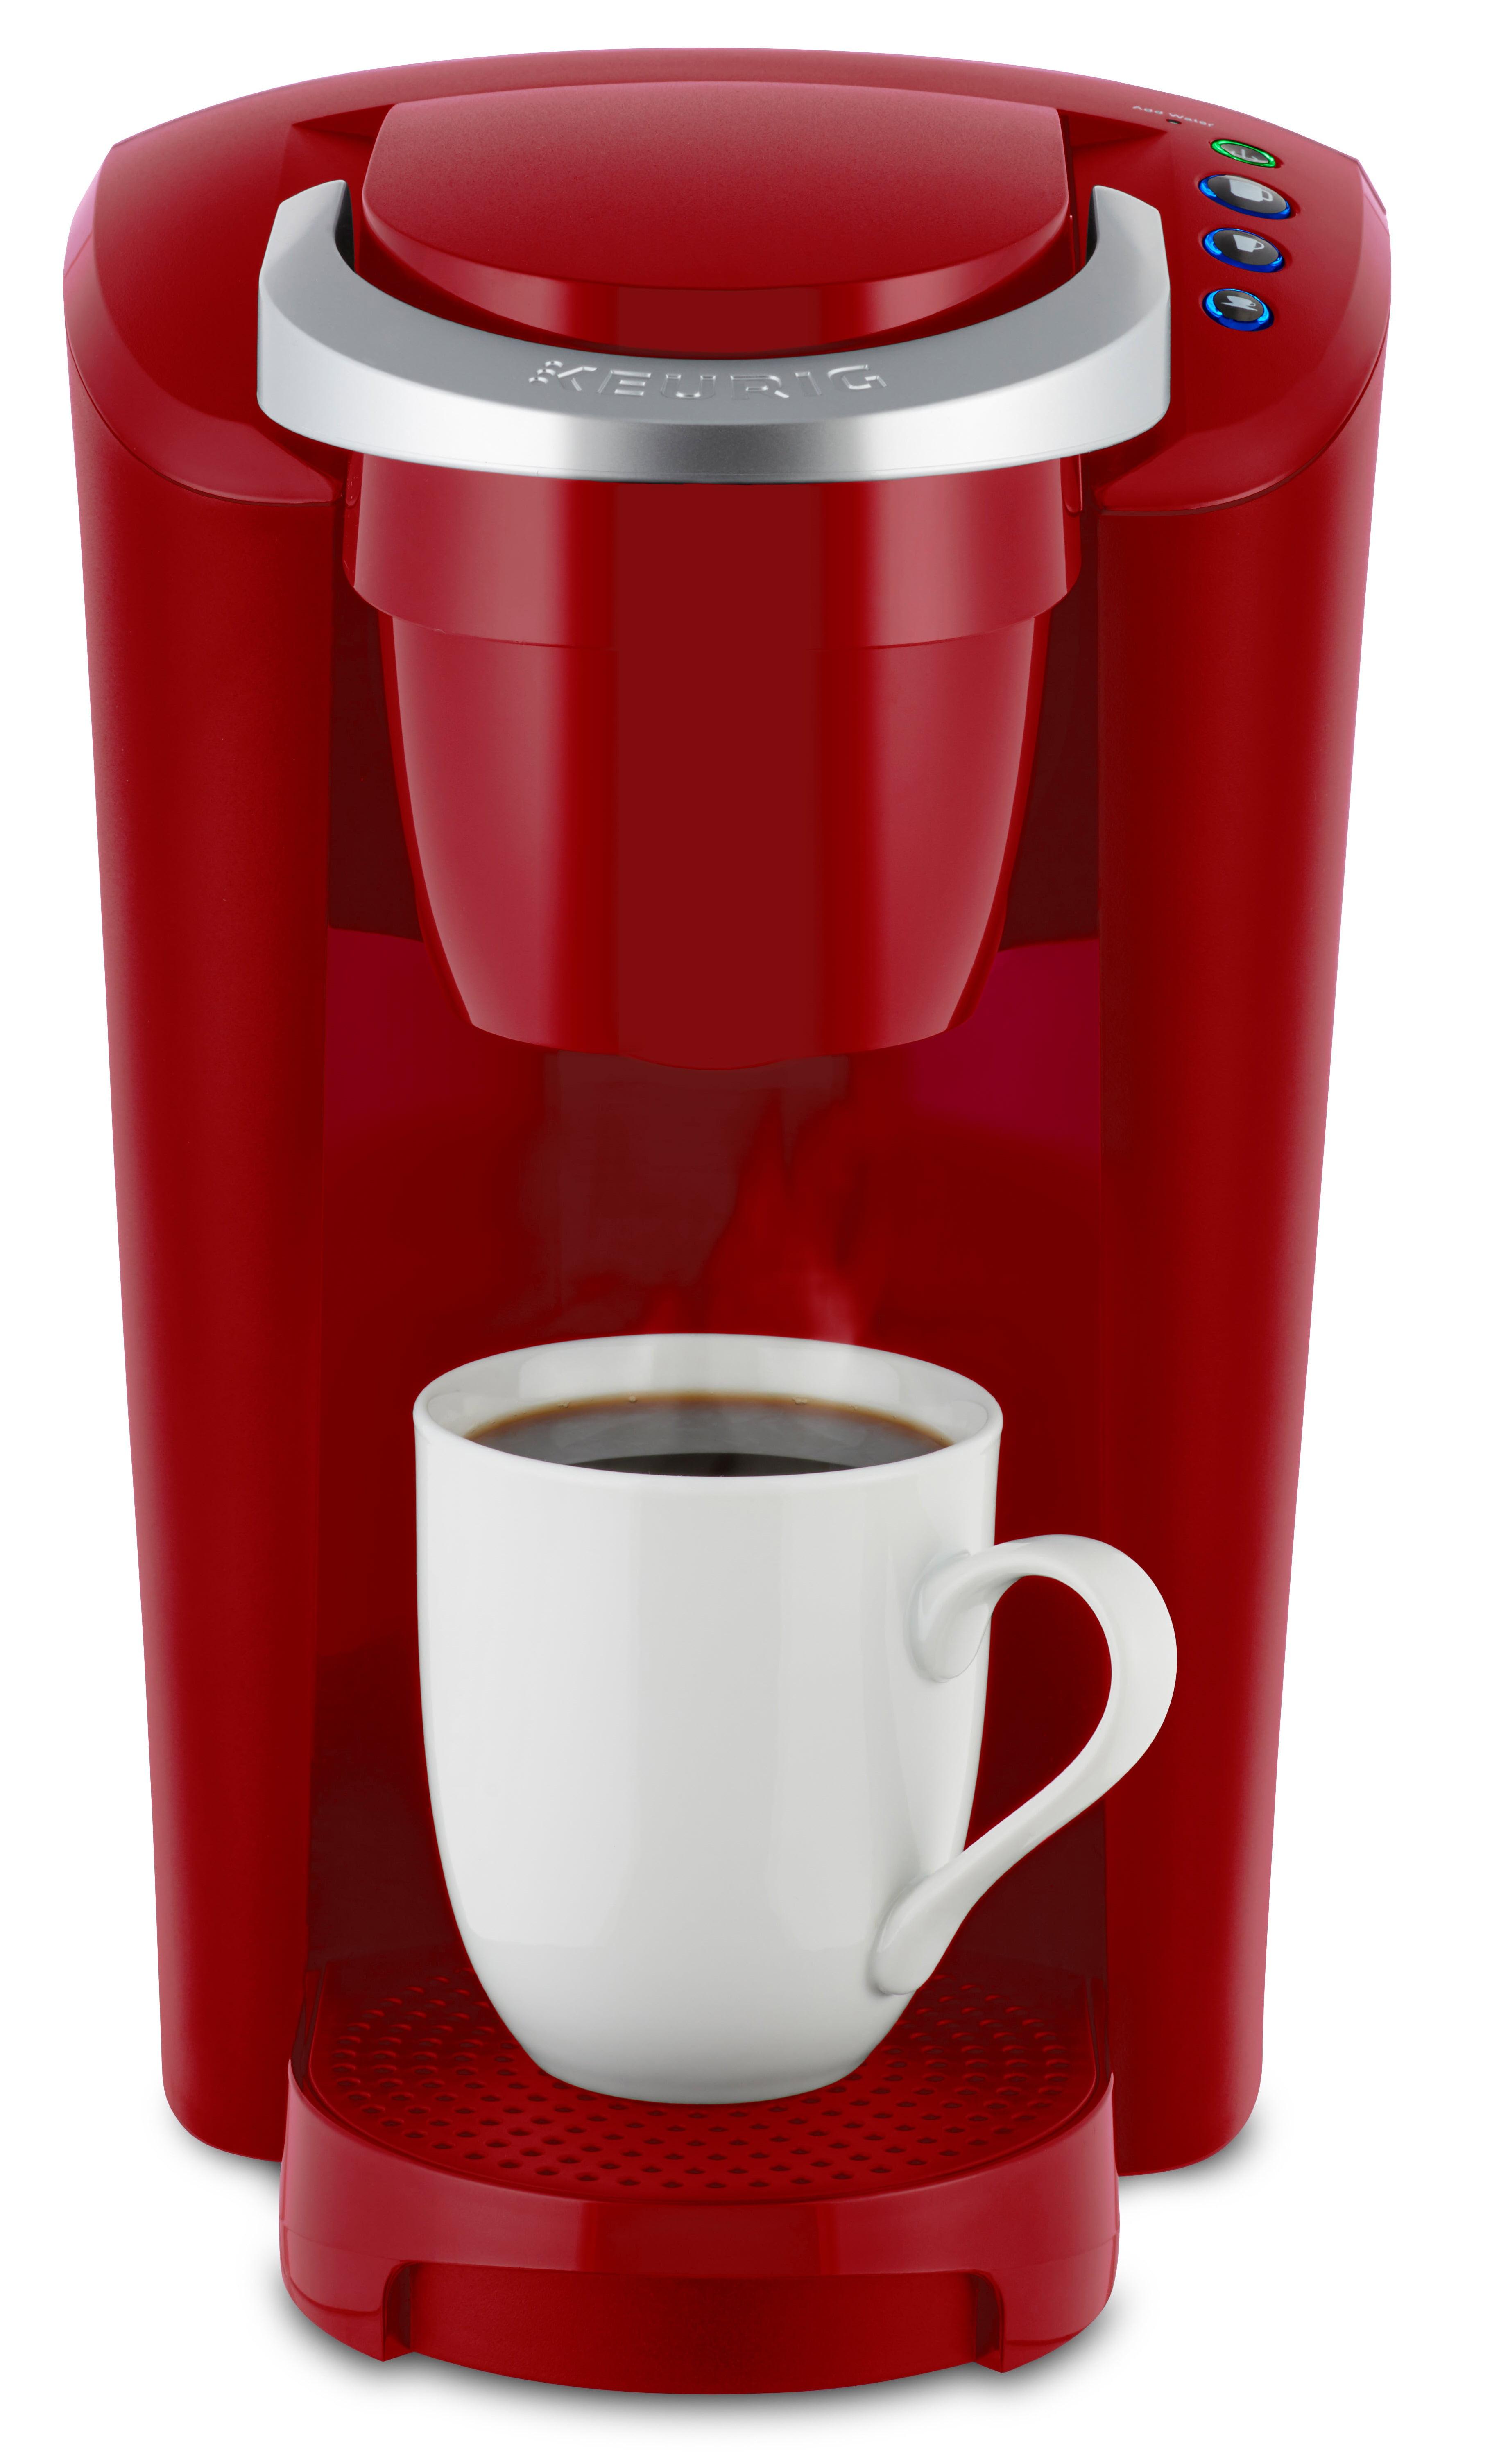 How To Use Red Keurig Coffee Maker : Keurig K-Compact Single Serve Coffee Maker Red eBay